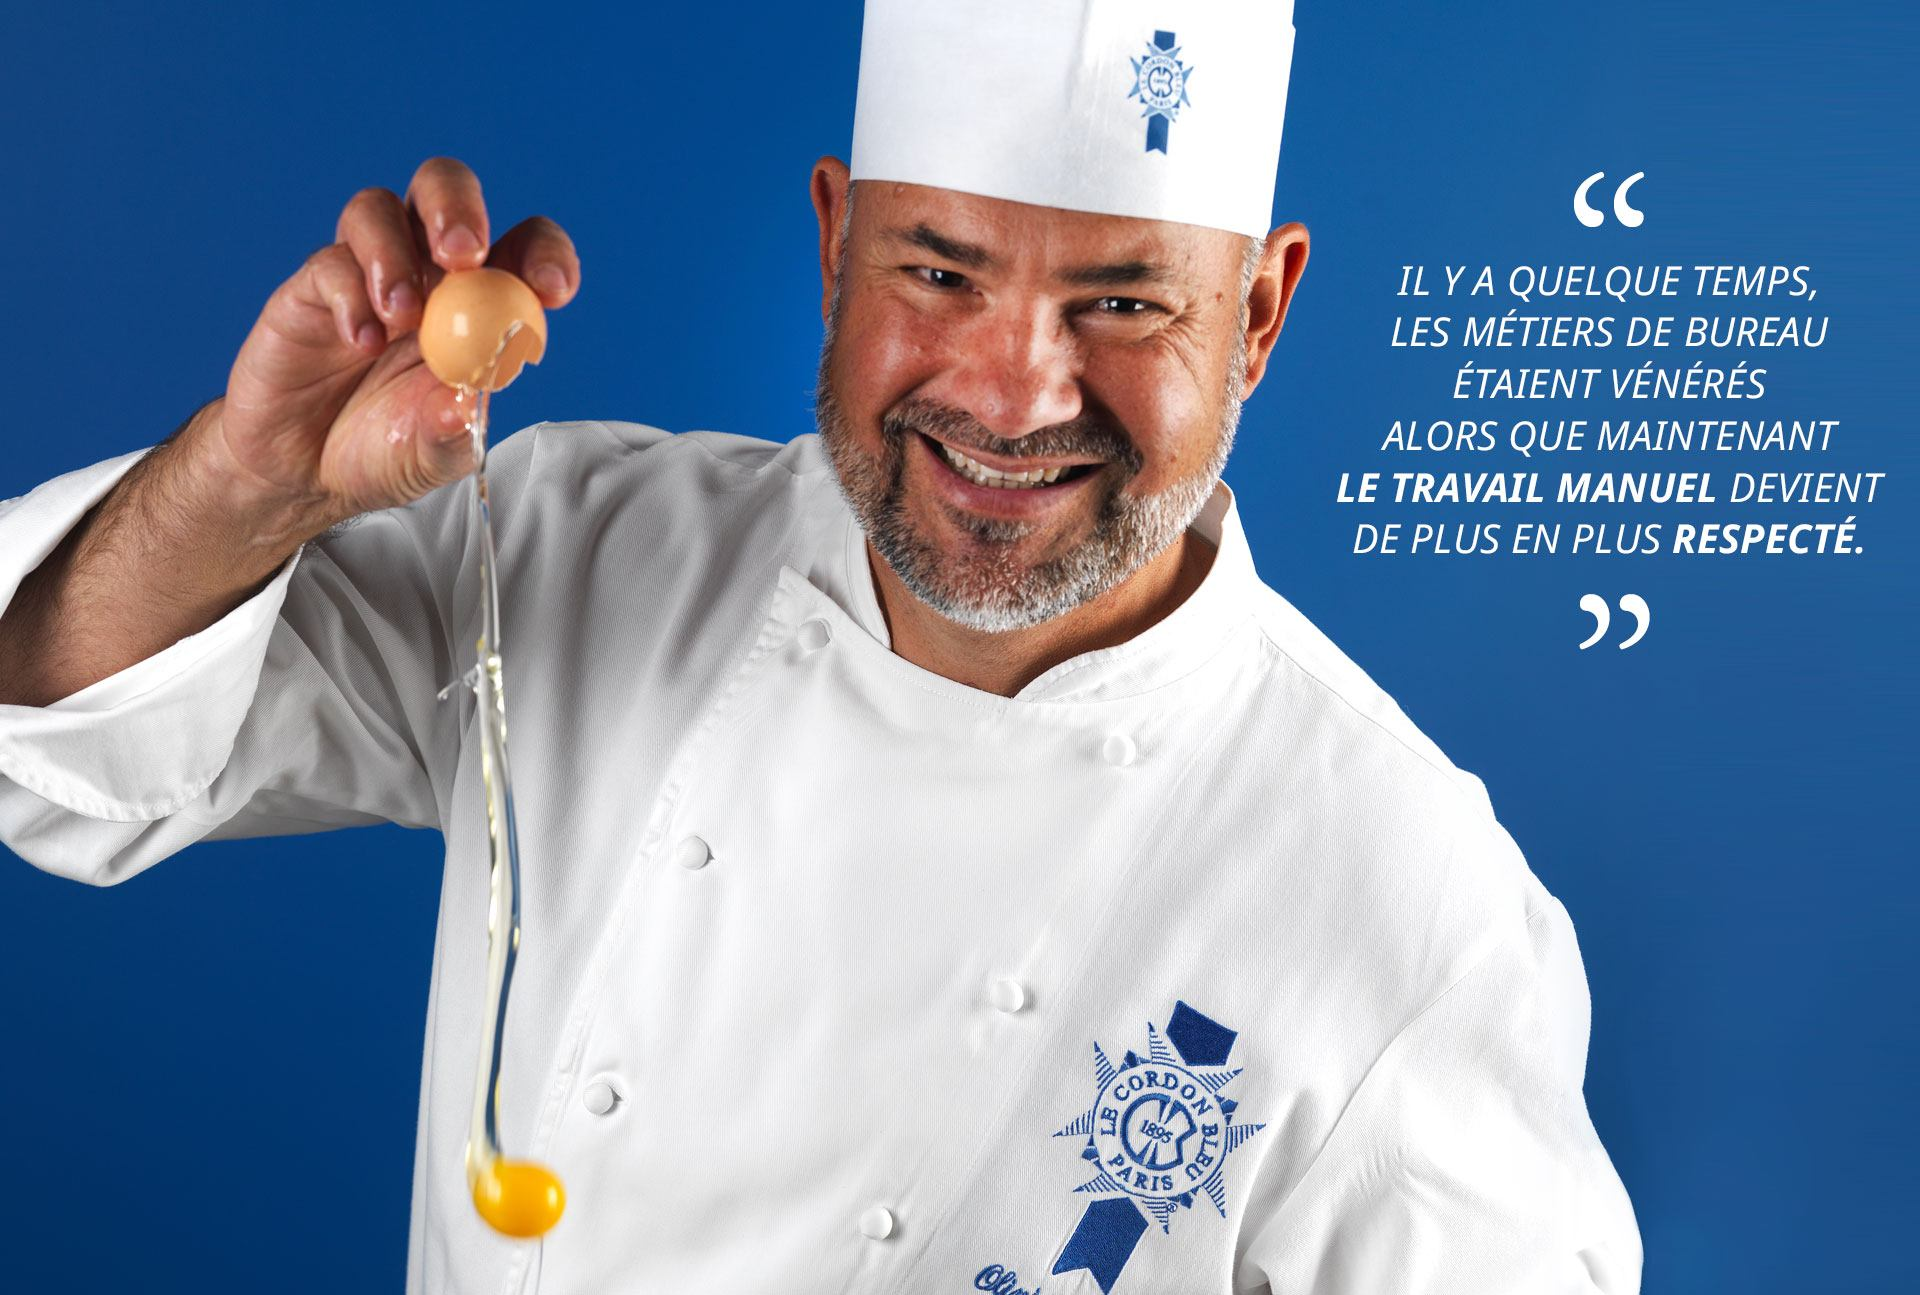 Chef pâtissier Olivier Mahut